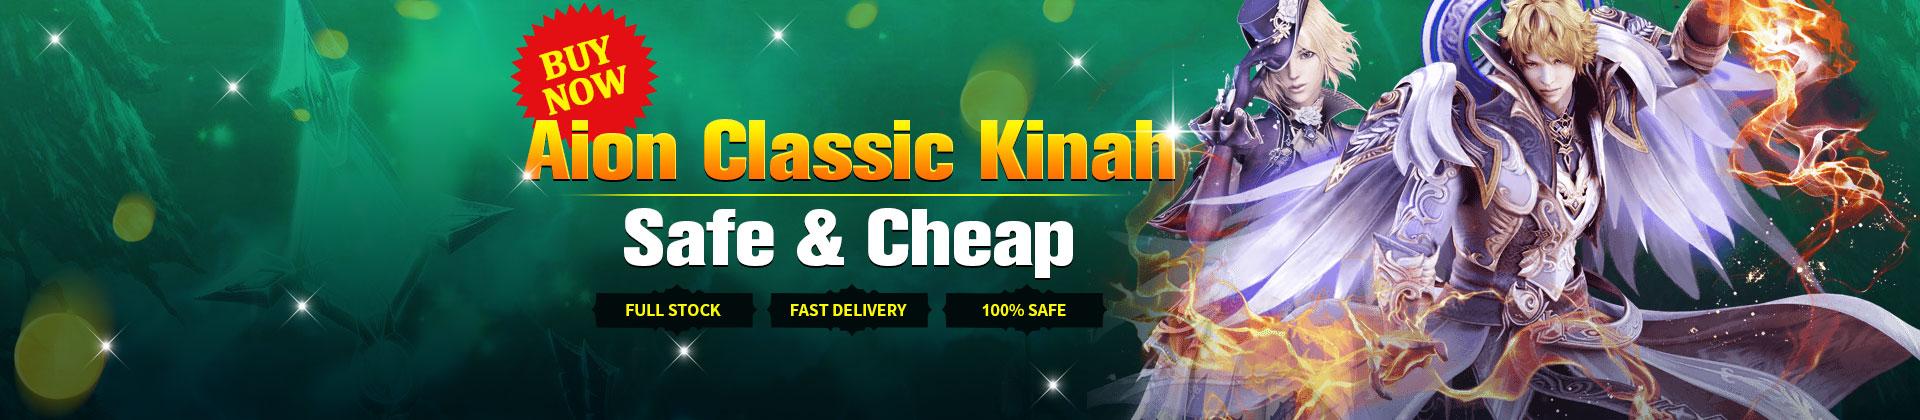 Buy Aion Classic Kinah